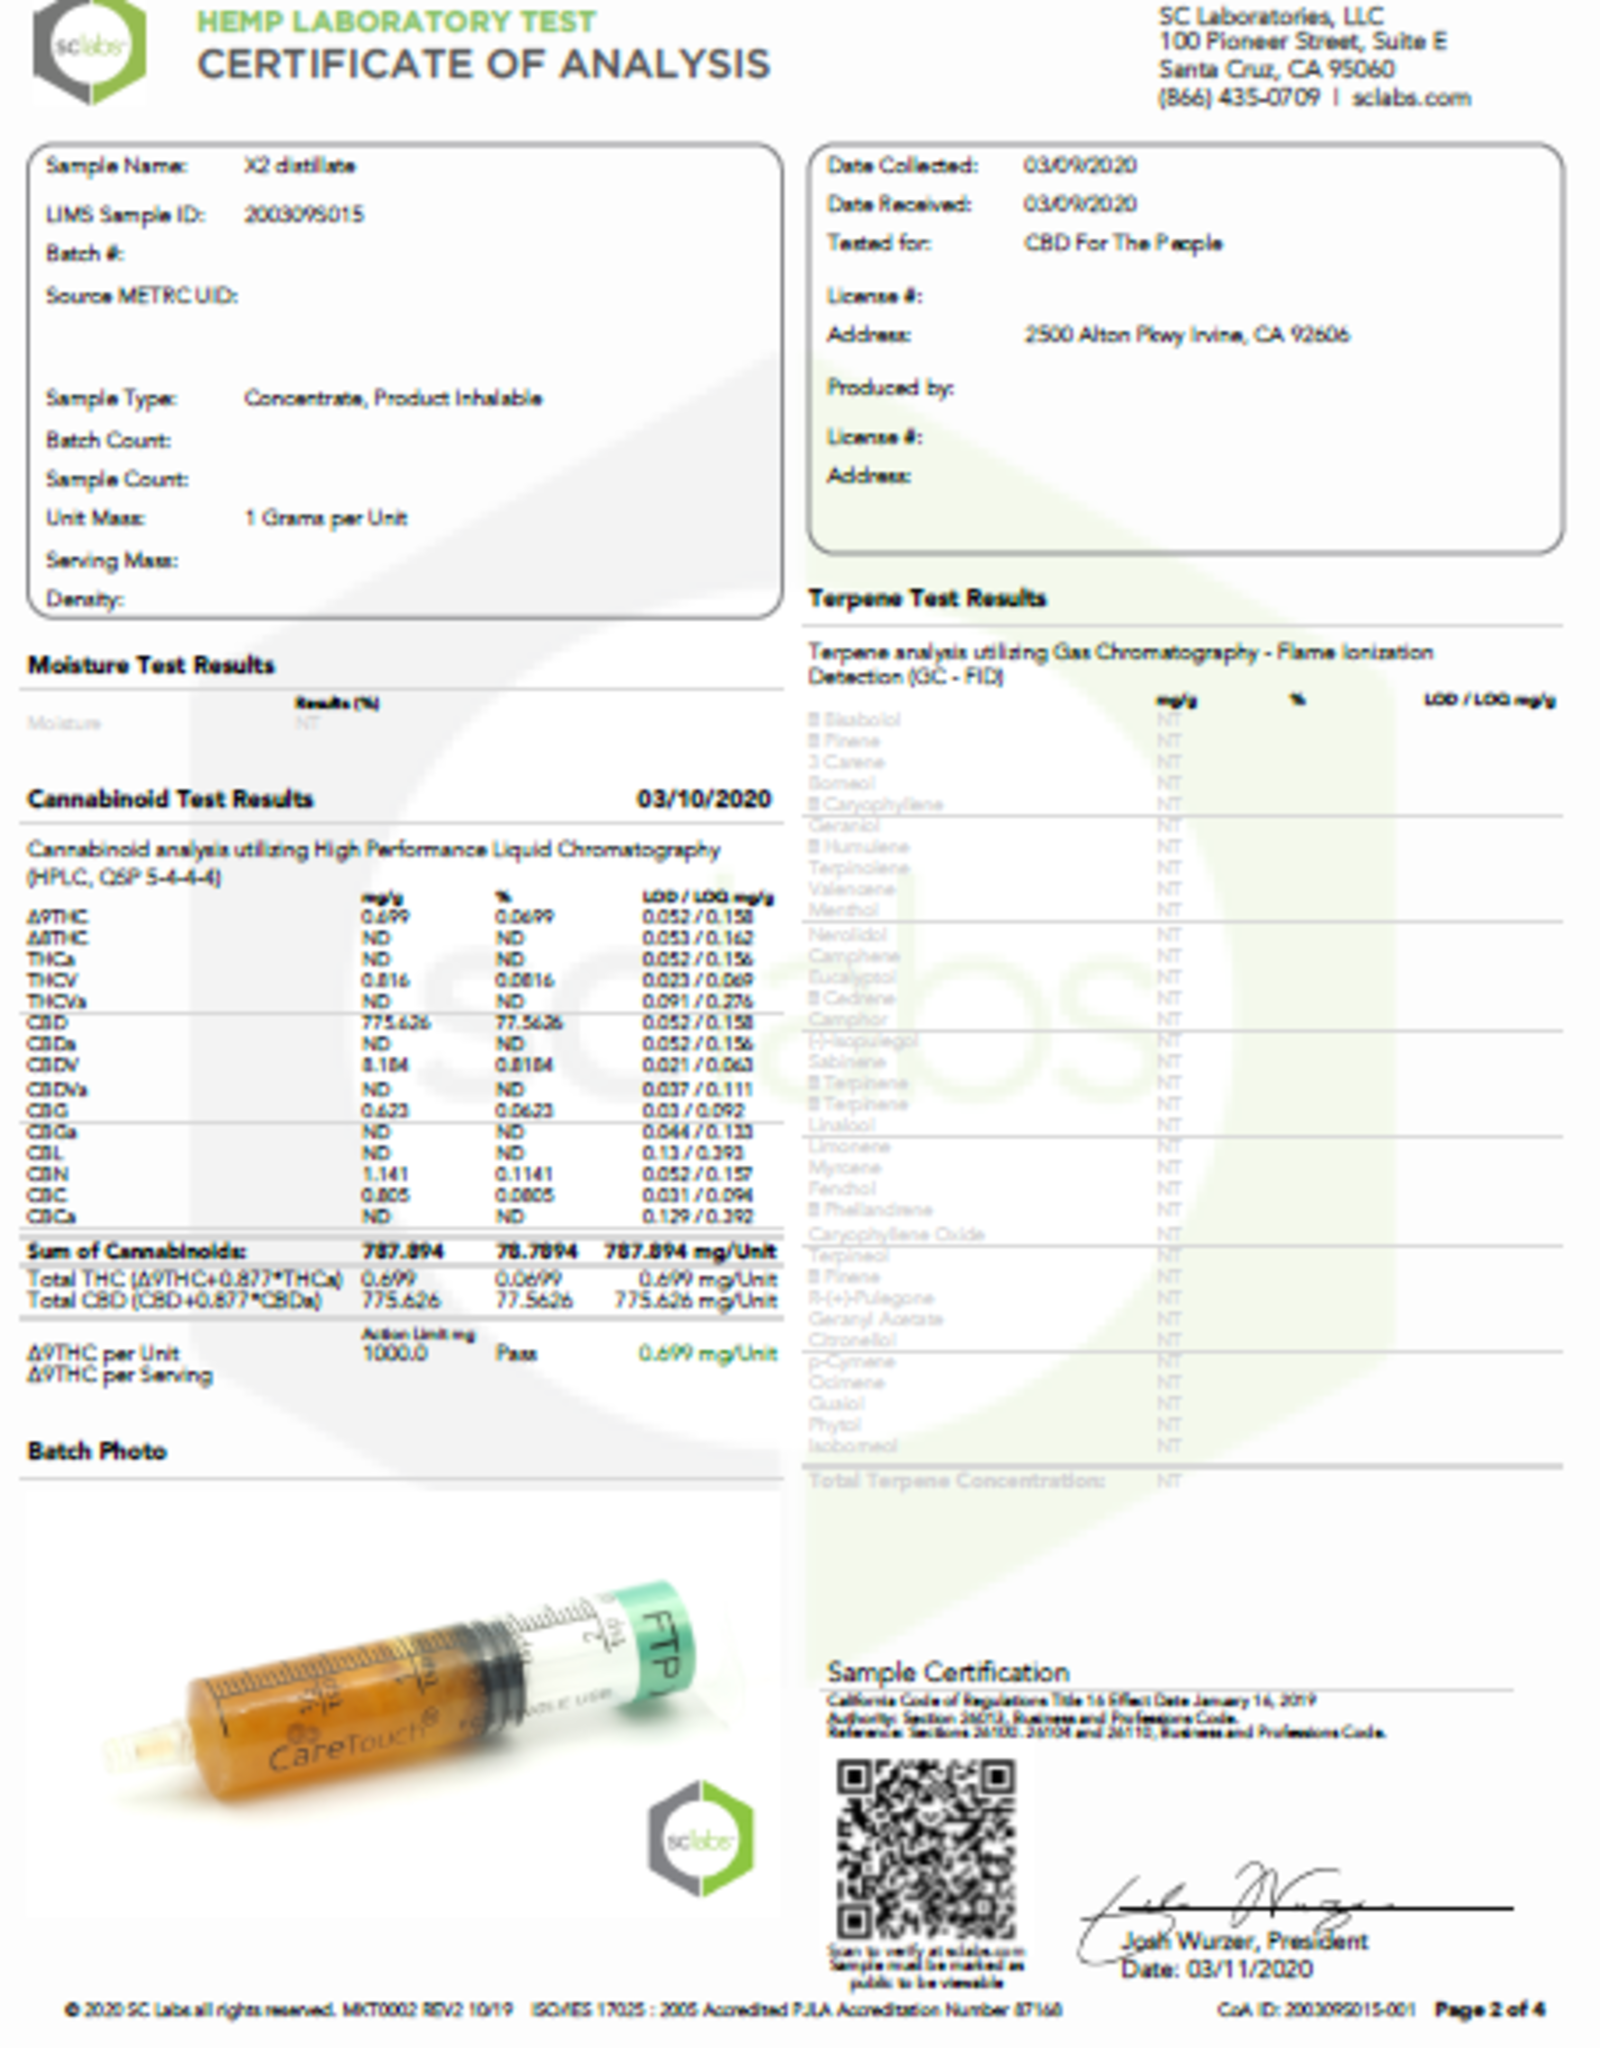 Full Spectrum CBD Green Cush Uncut Wax Cartridge, 325mg, Sativa X2